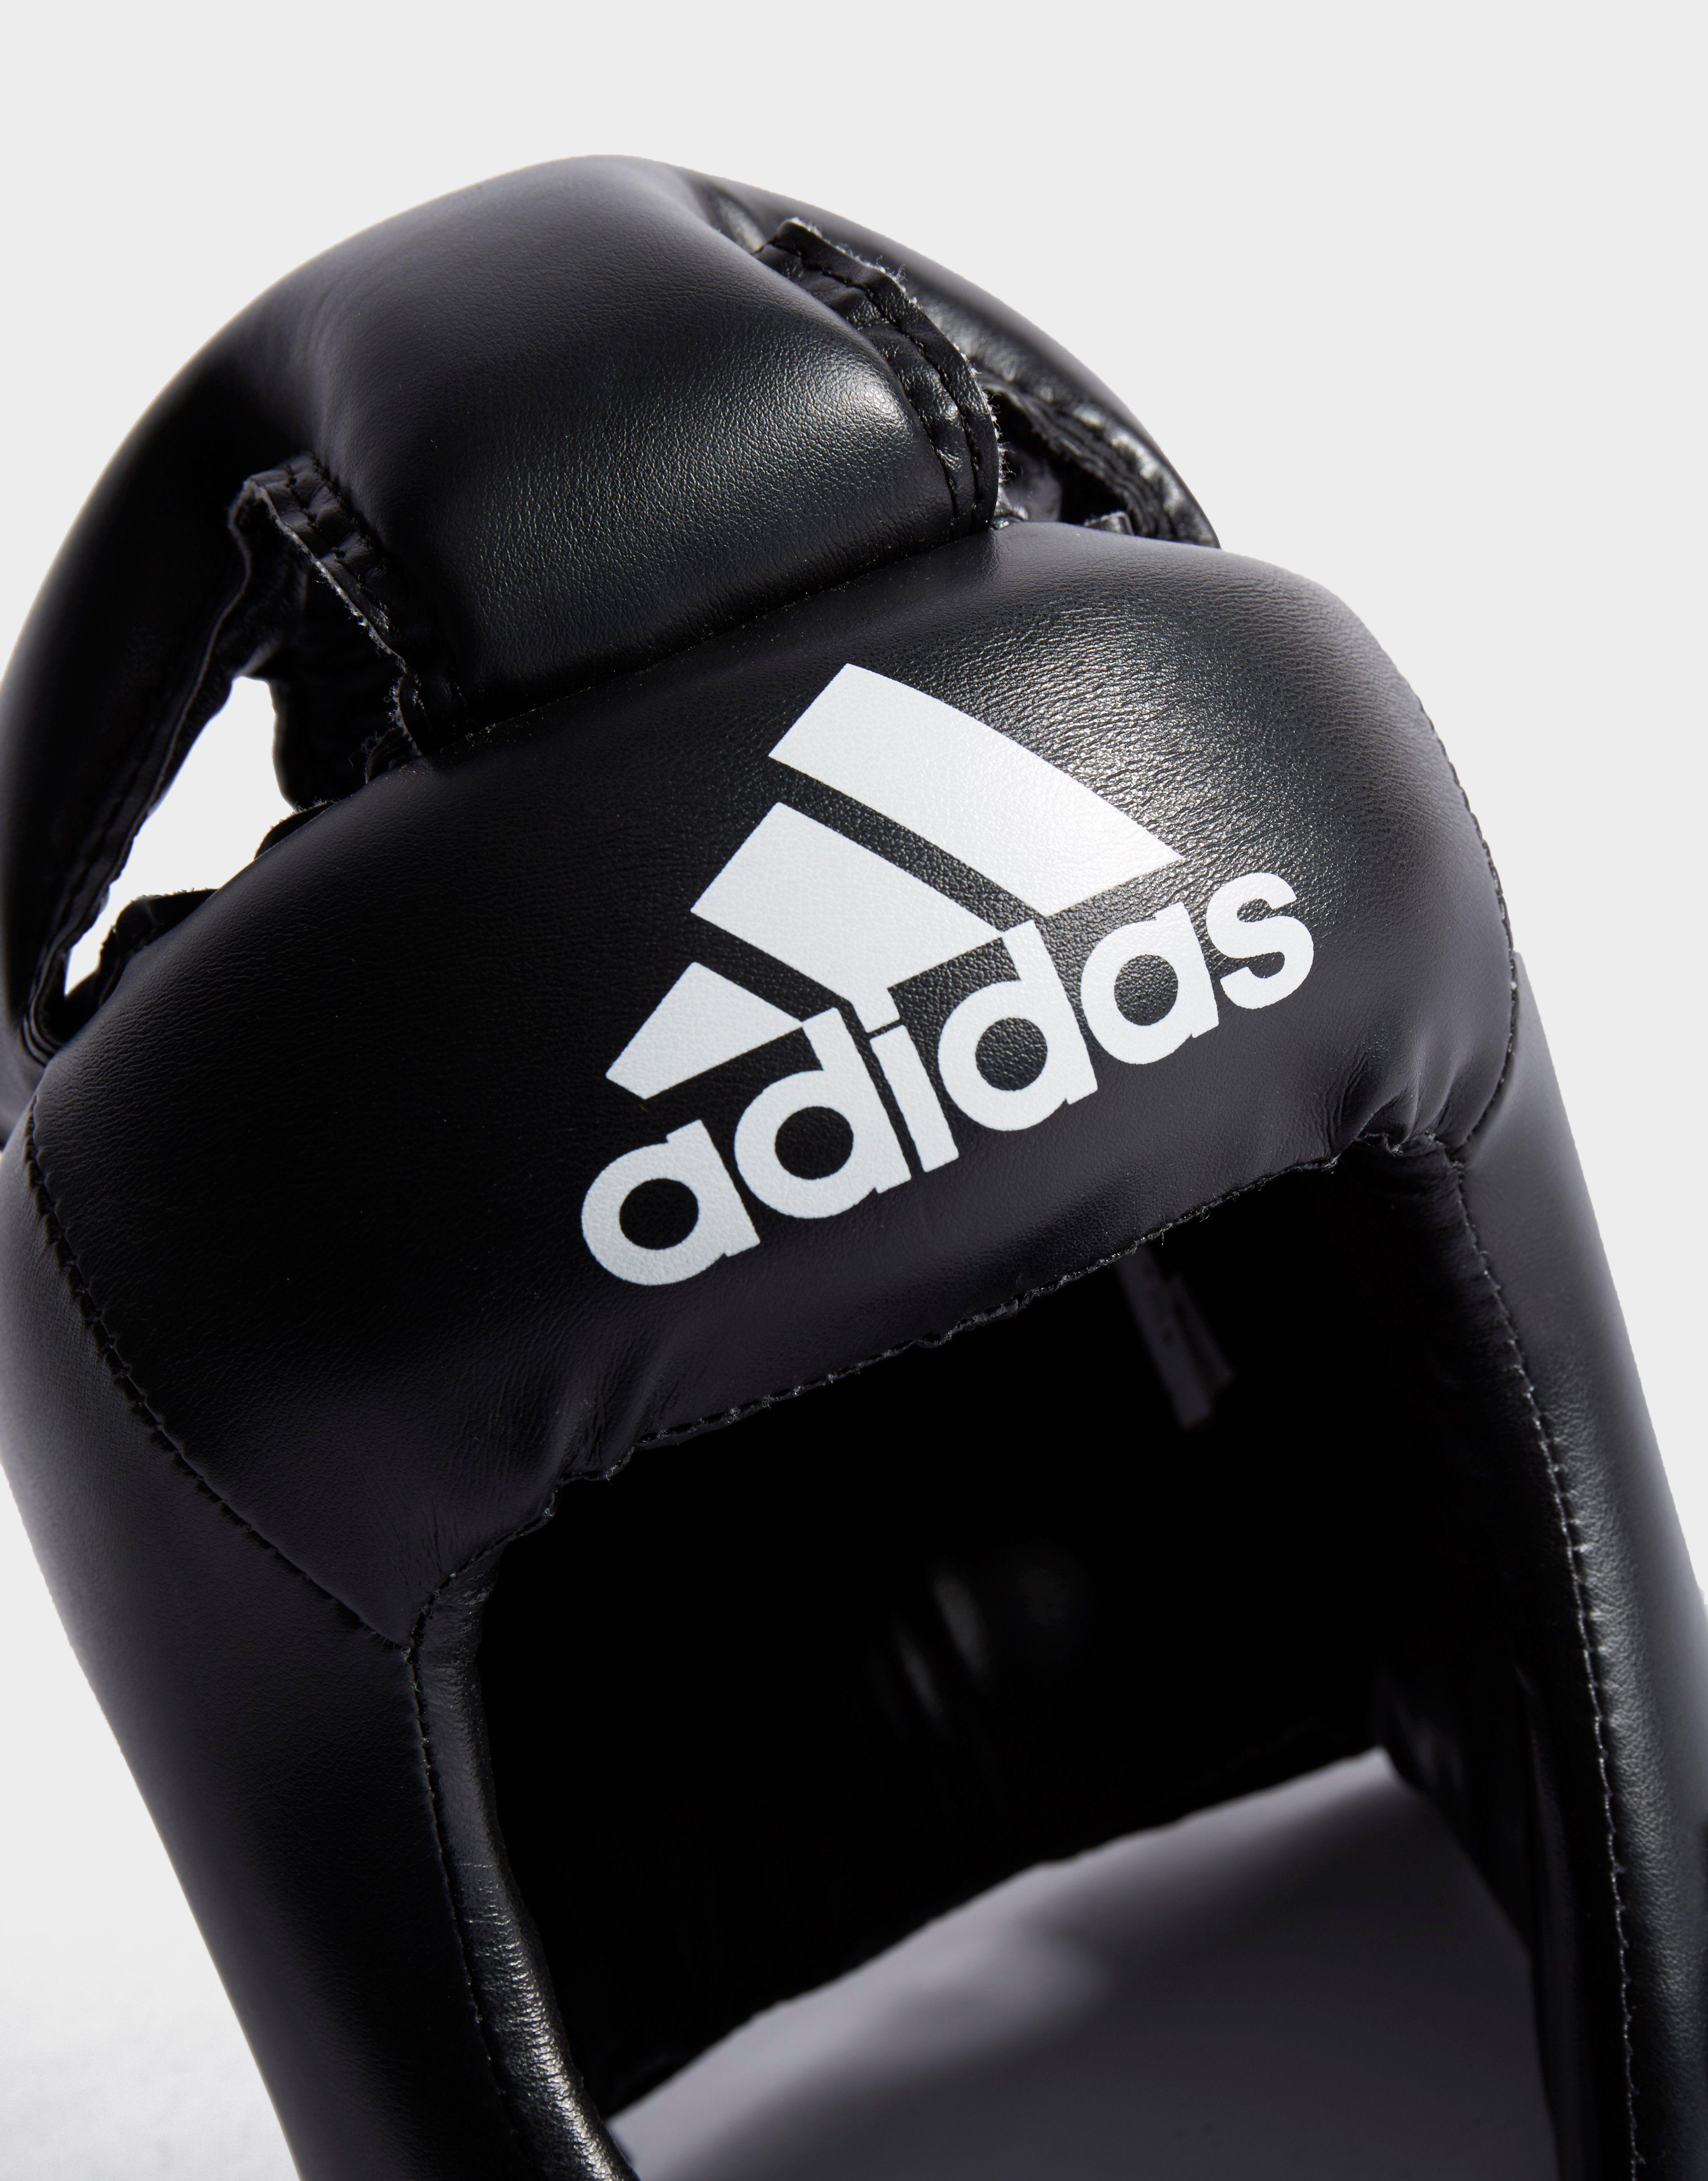 adidas Rookie Head Guard